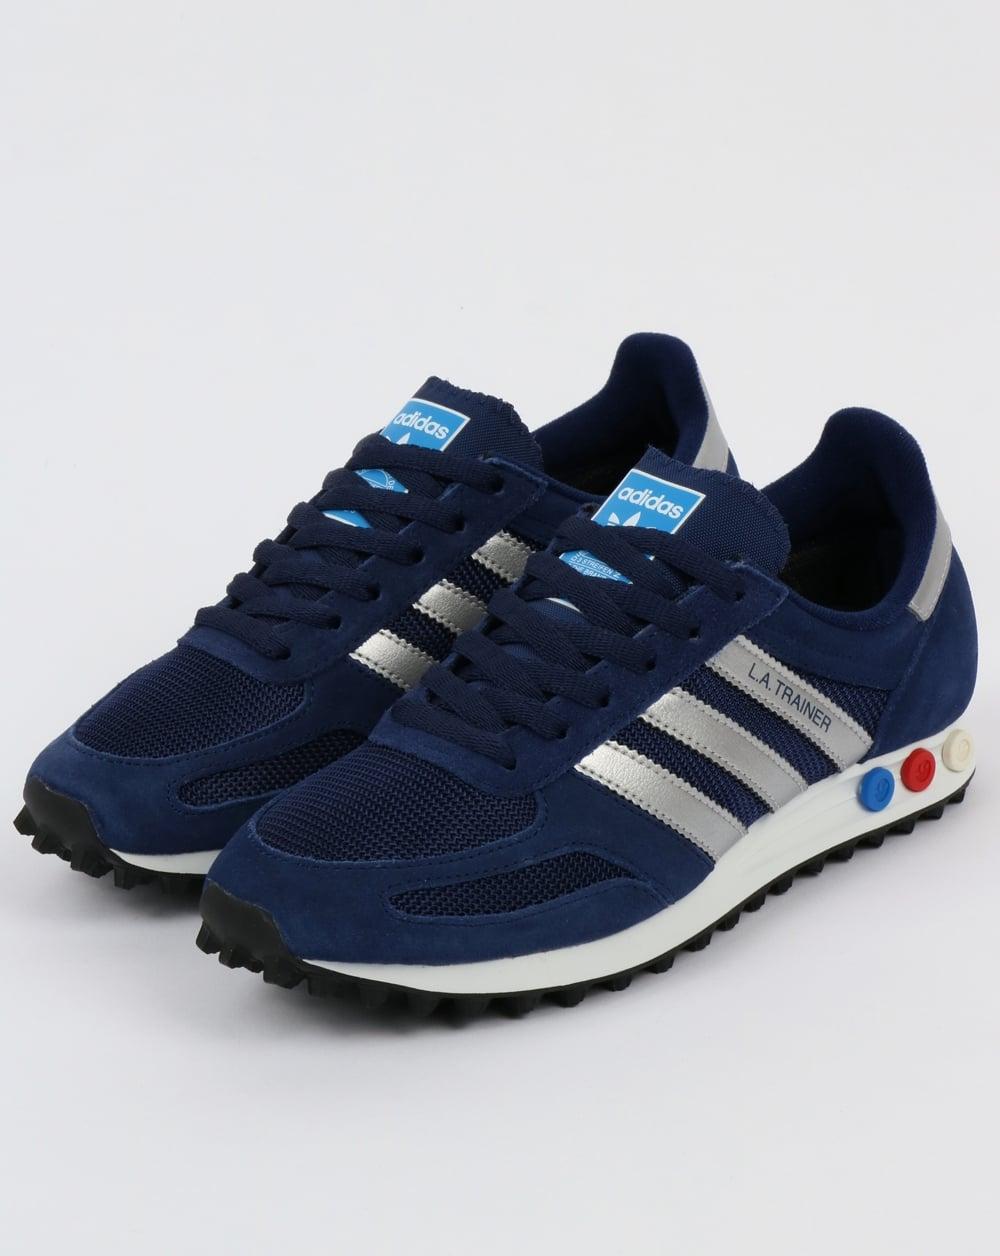 new concept 8ce66 9c19a adidas Trainers Adidas LA Trainer Dark BlueSilverGrey